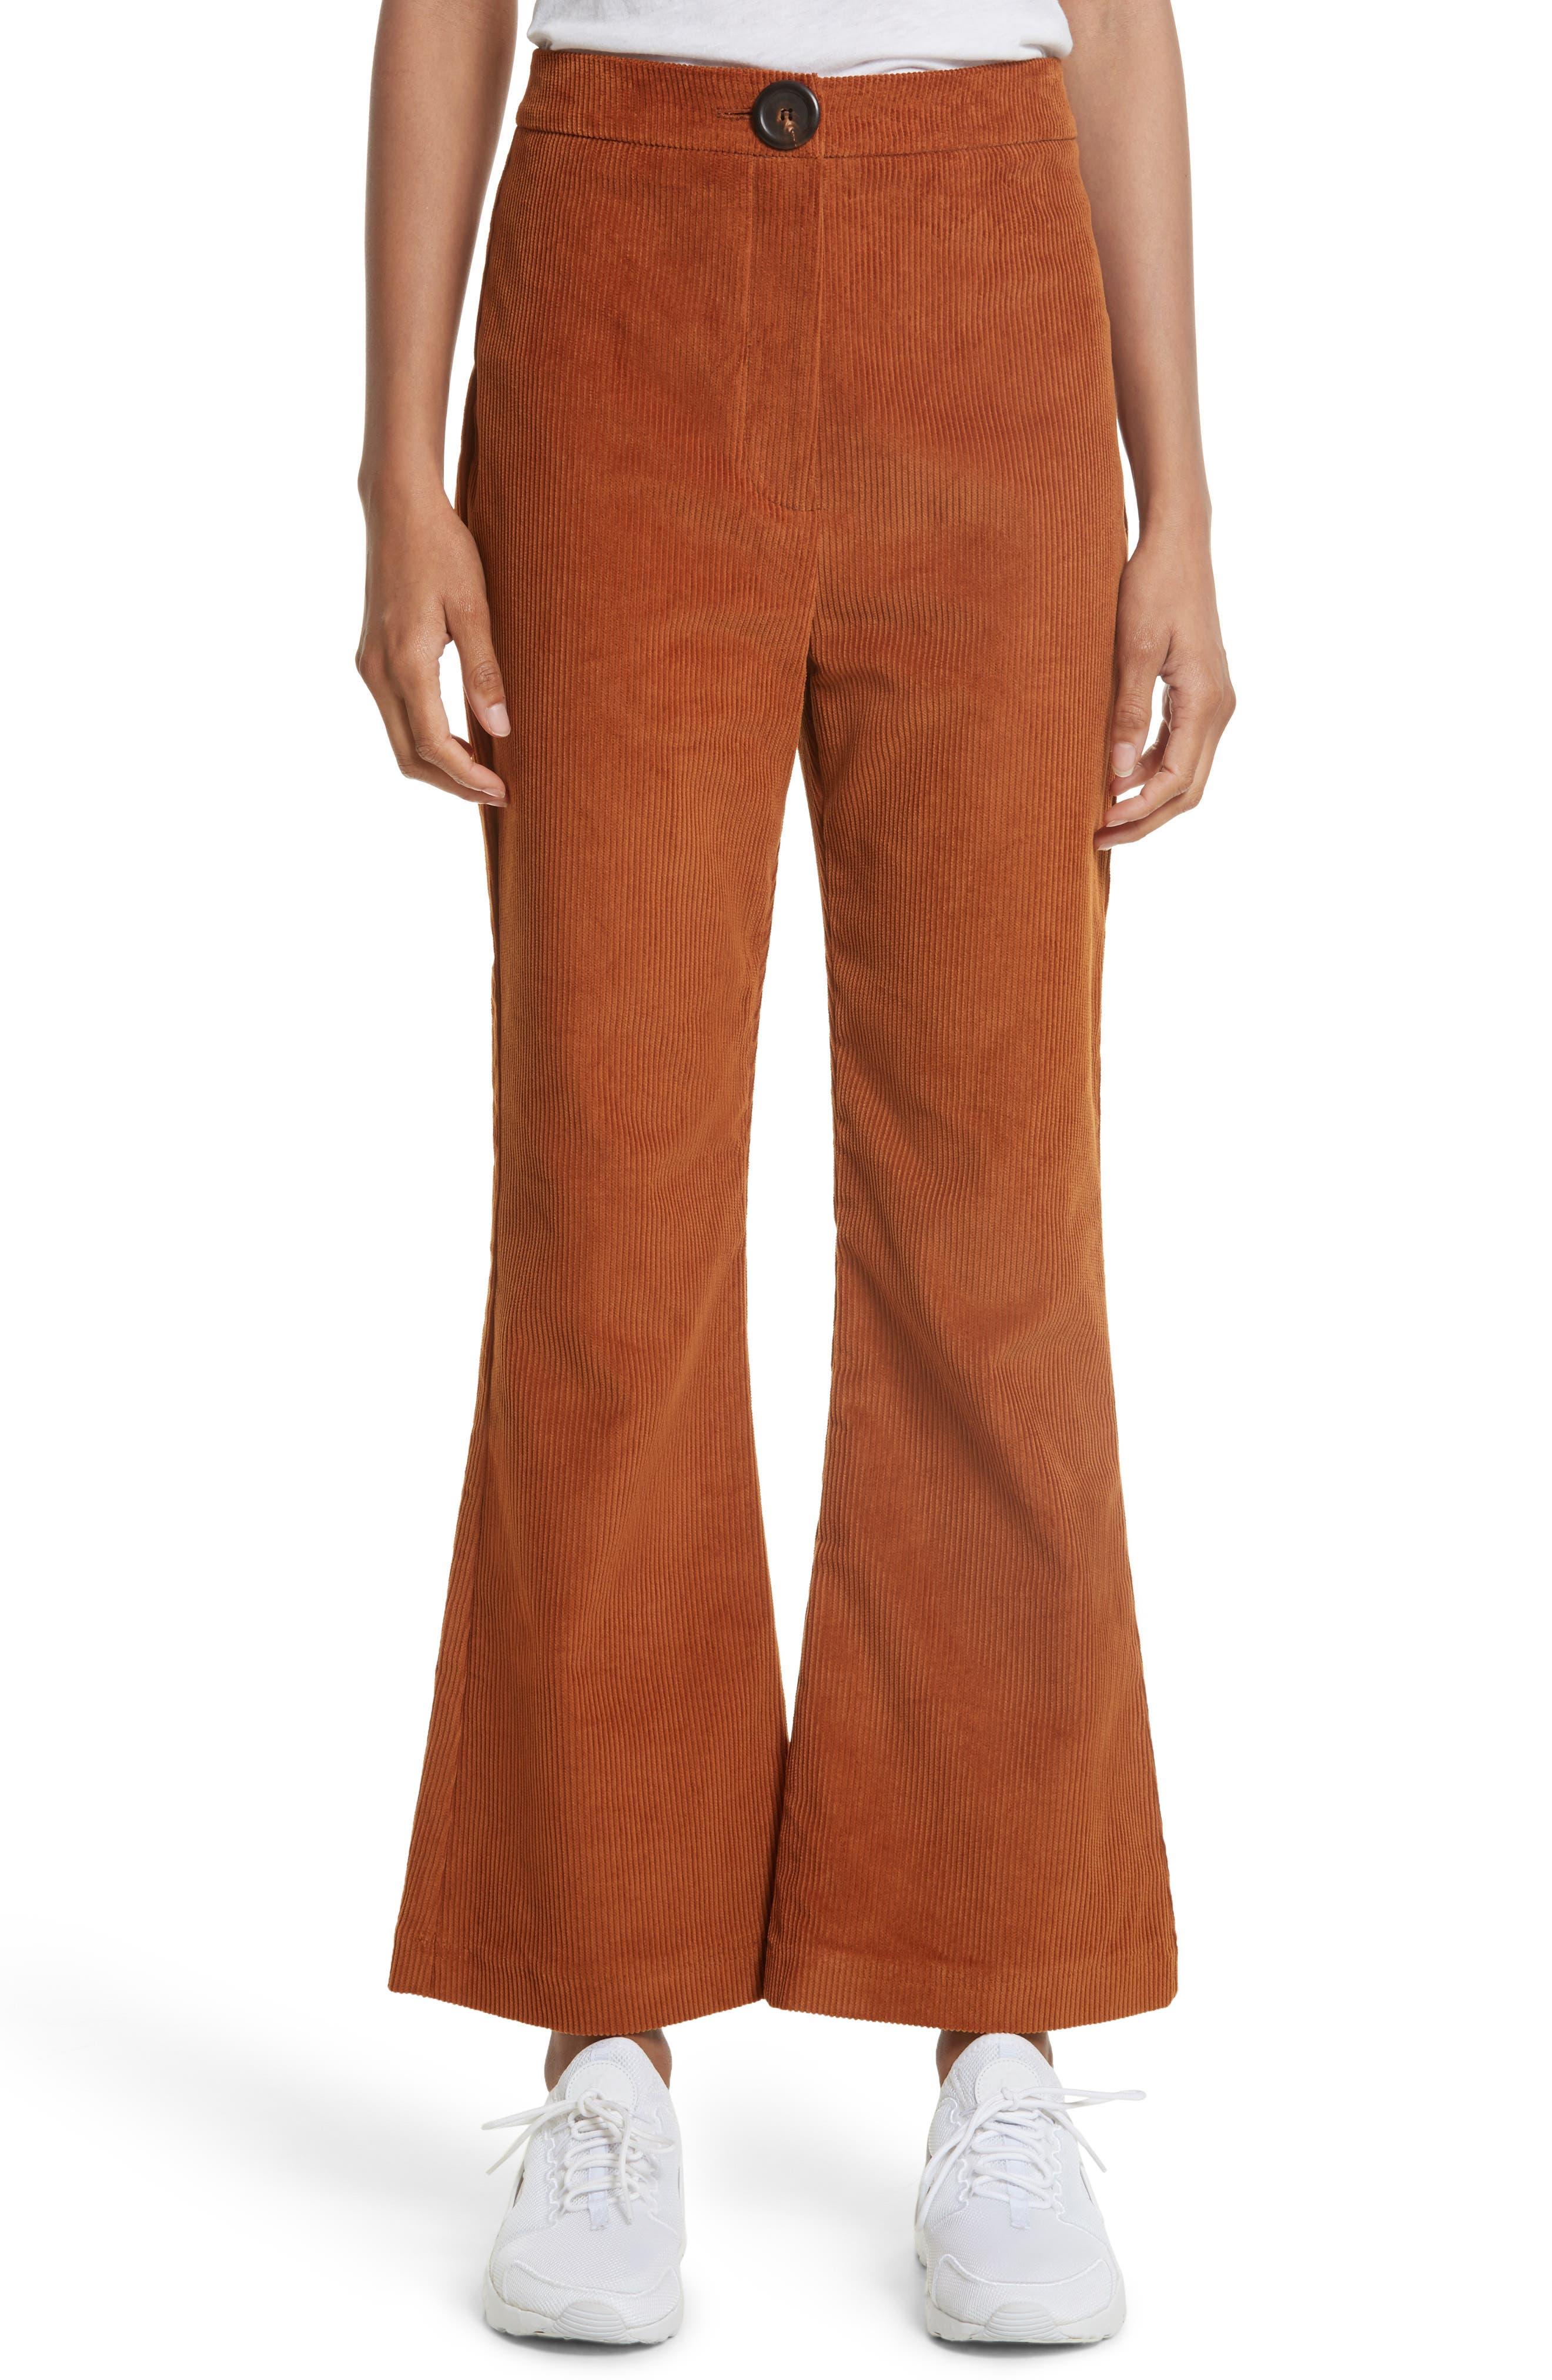 Crop Flare Corduroy Trousers,                             Main thumbnail 1, color,                             200